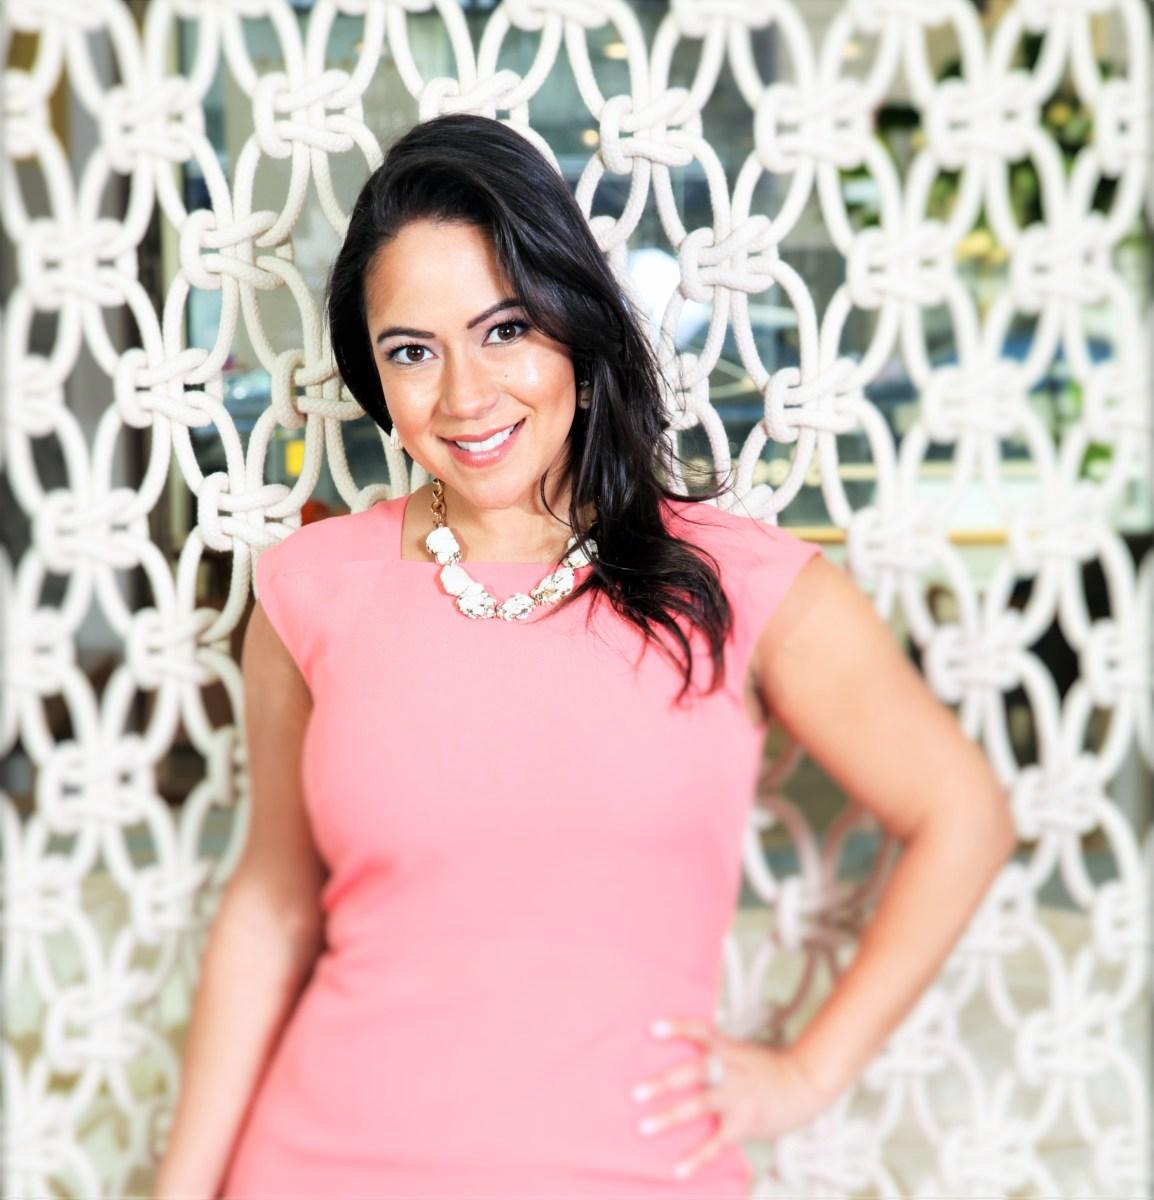 Meet: Yai Vargas a National Latino Marketing Manager for New York Life.